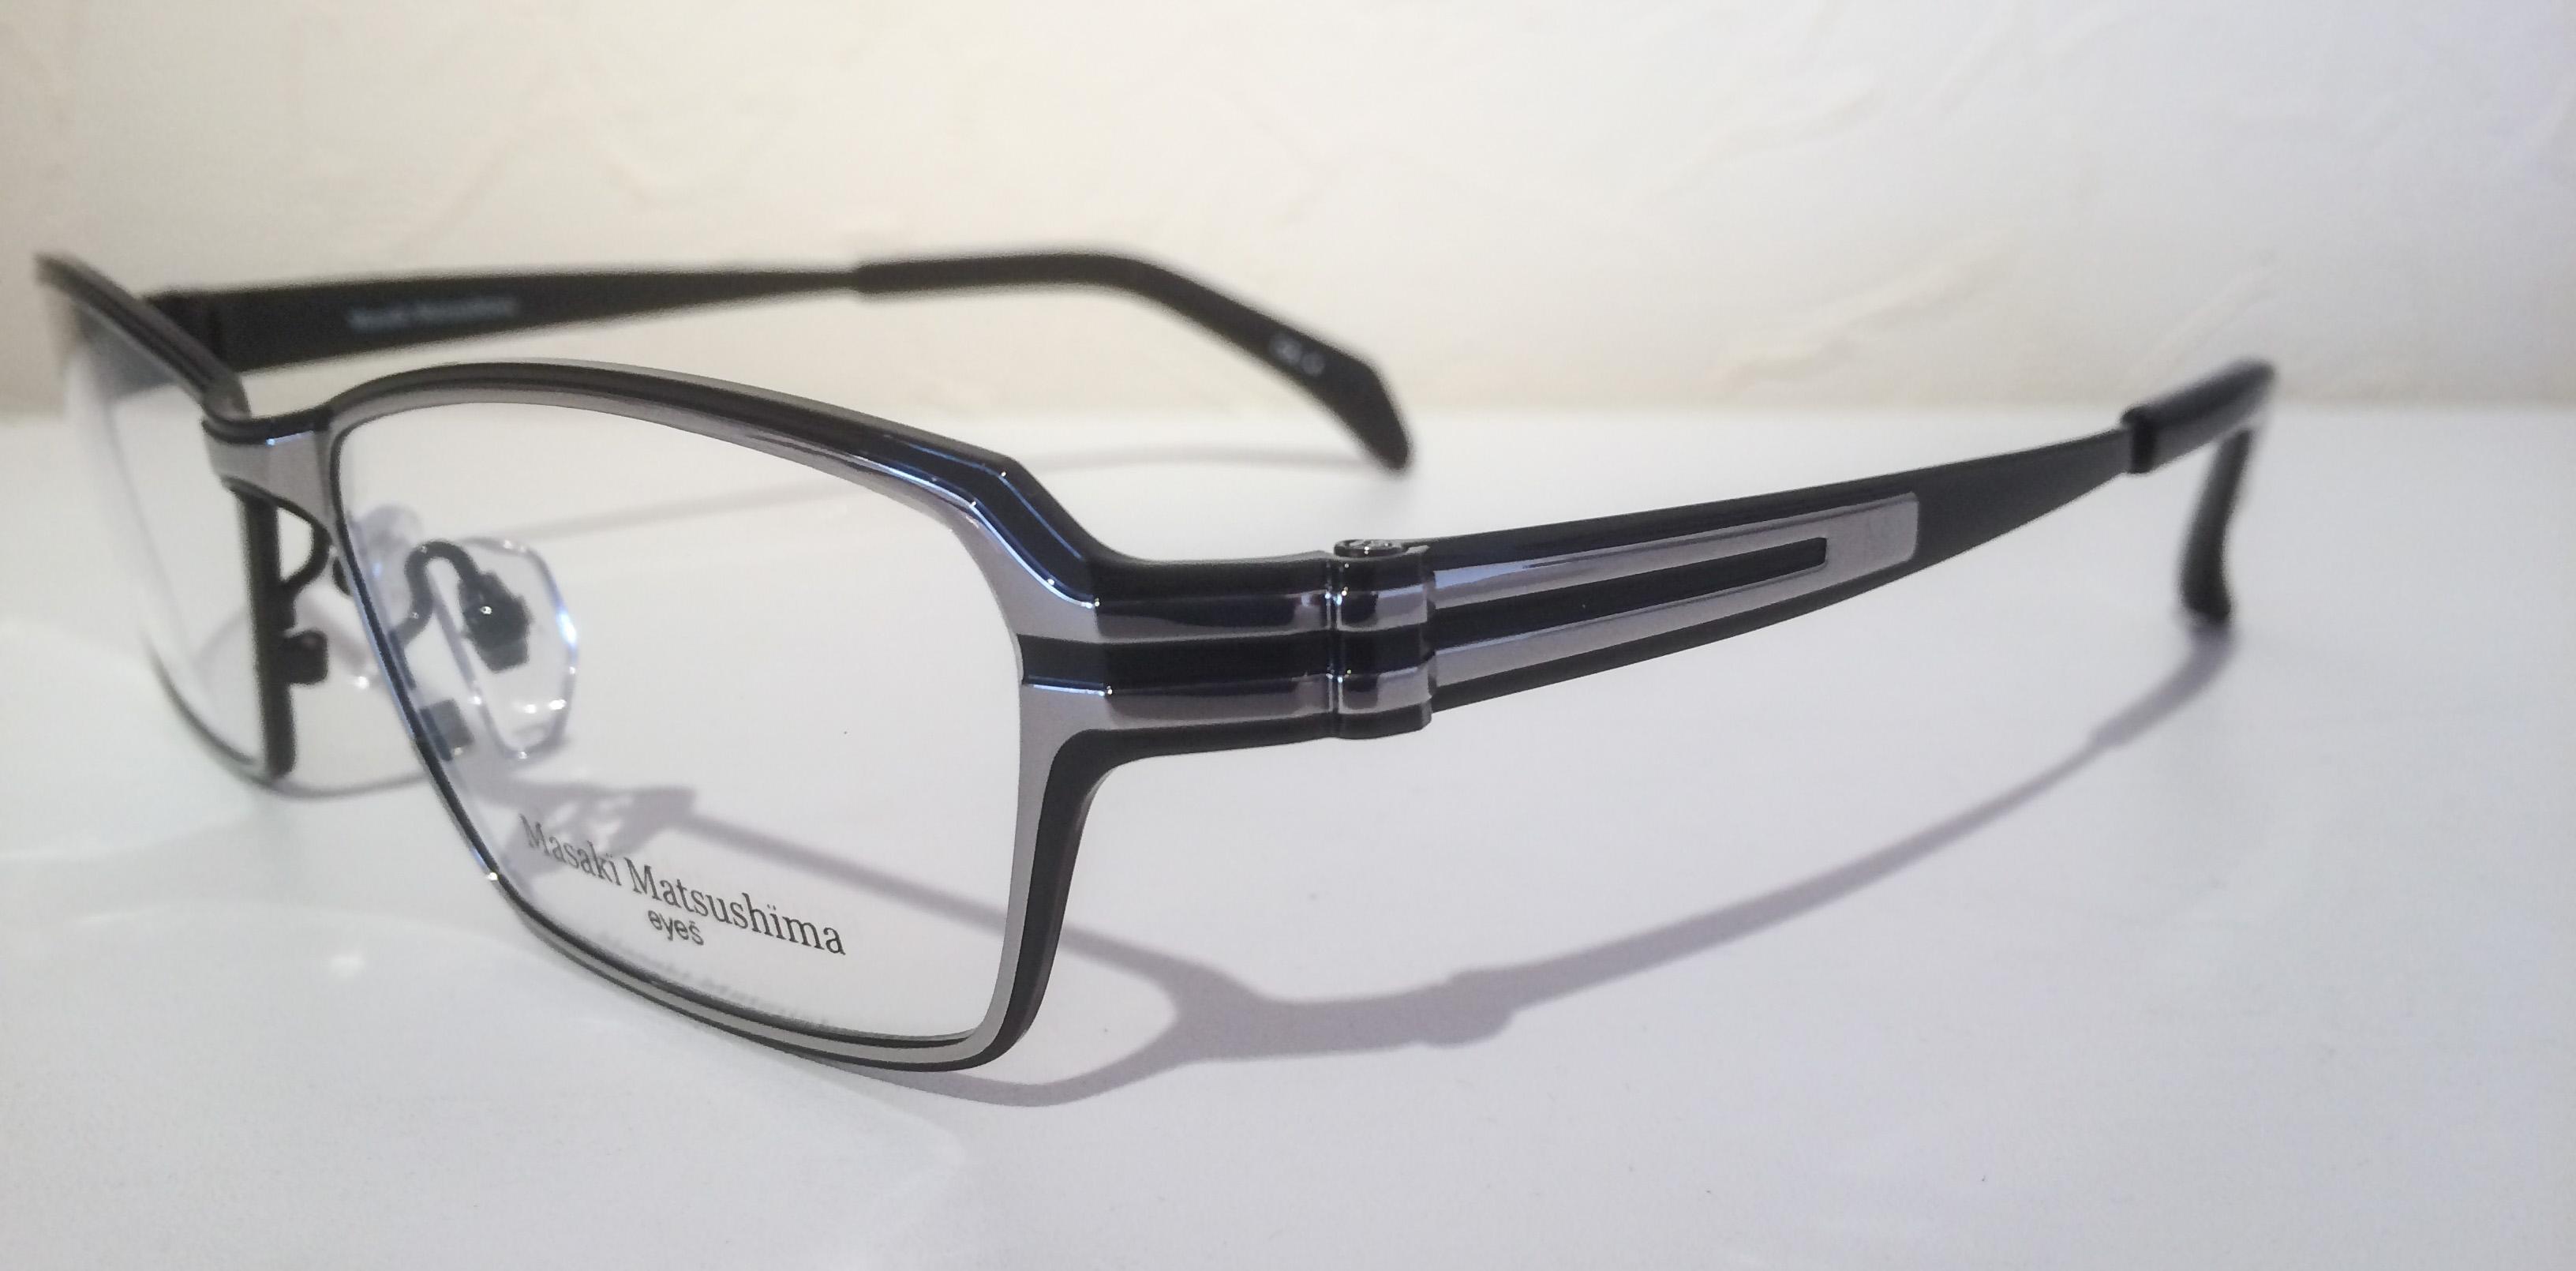 Masaki Matsushima New model!(二見)_a0150916_1265659.jpg